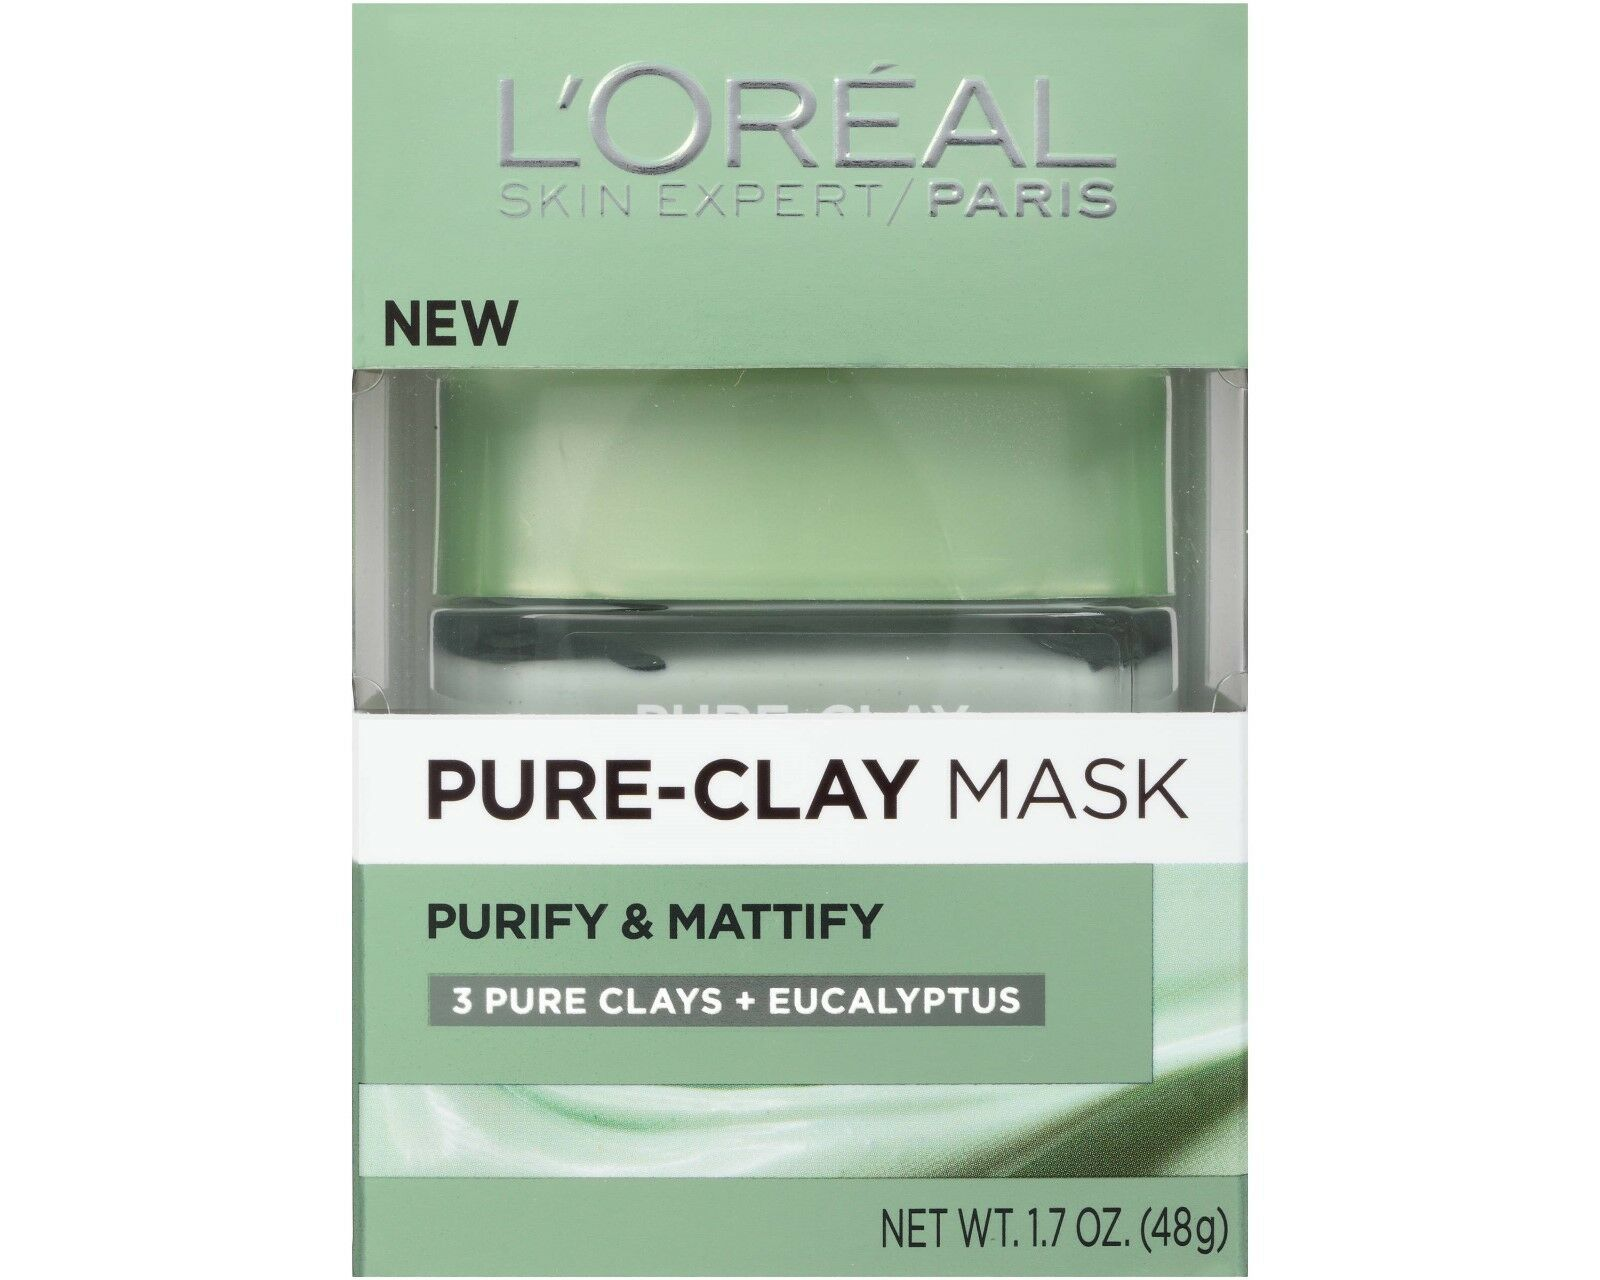 L'oreal pure-clay mask purify & mattify 3 pure clays+